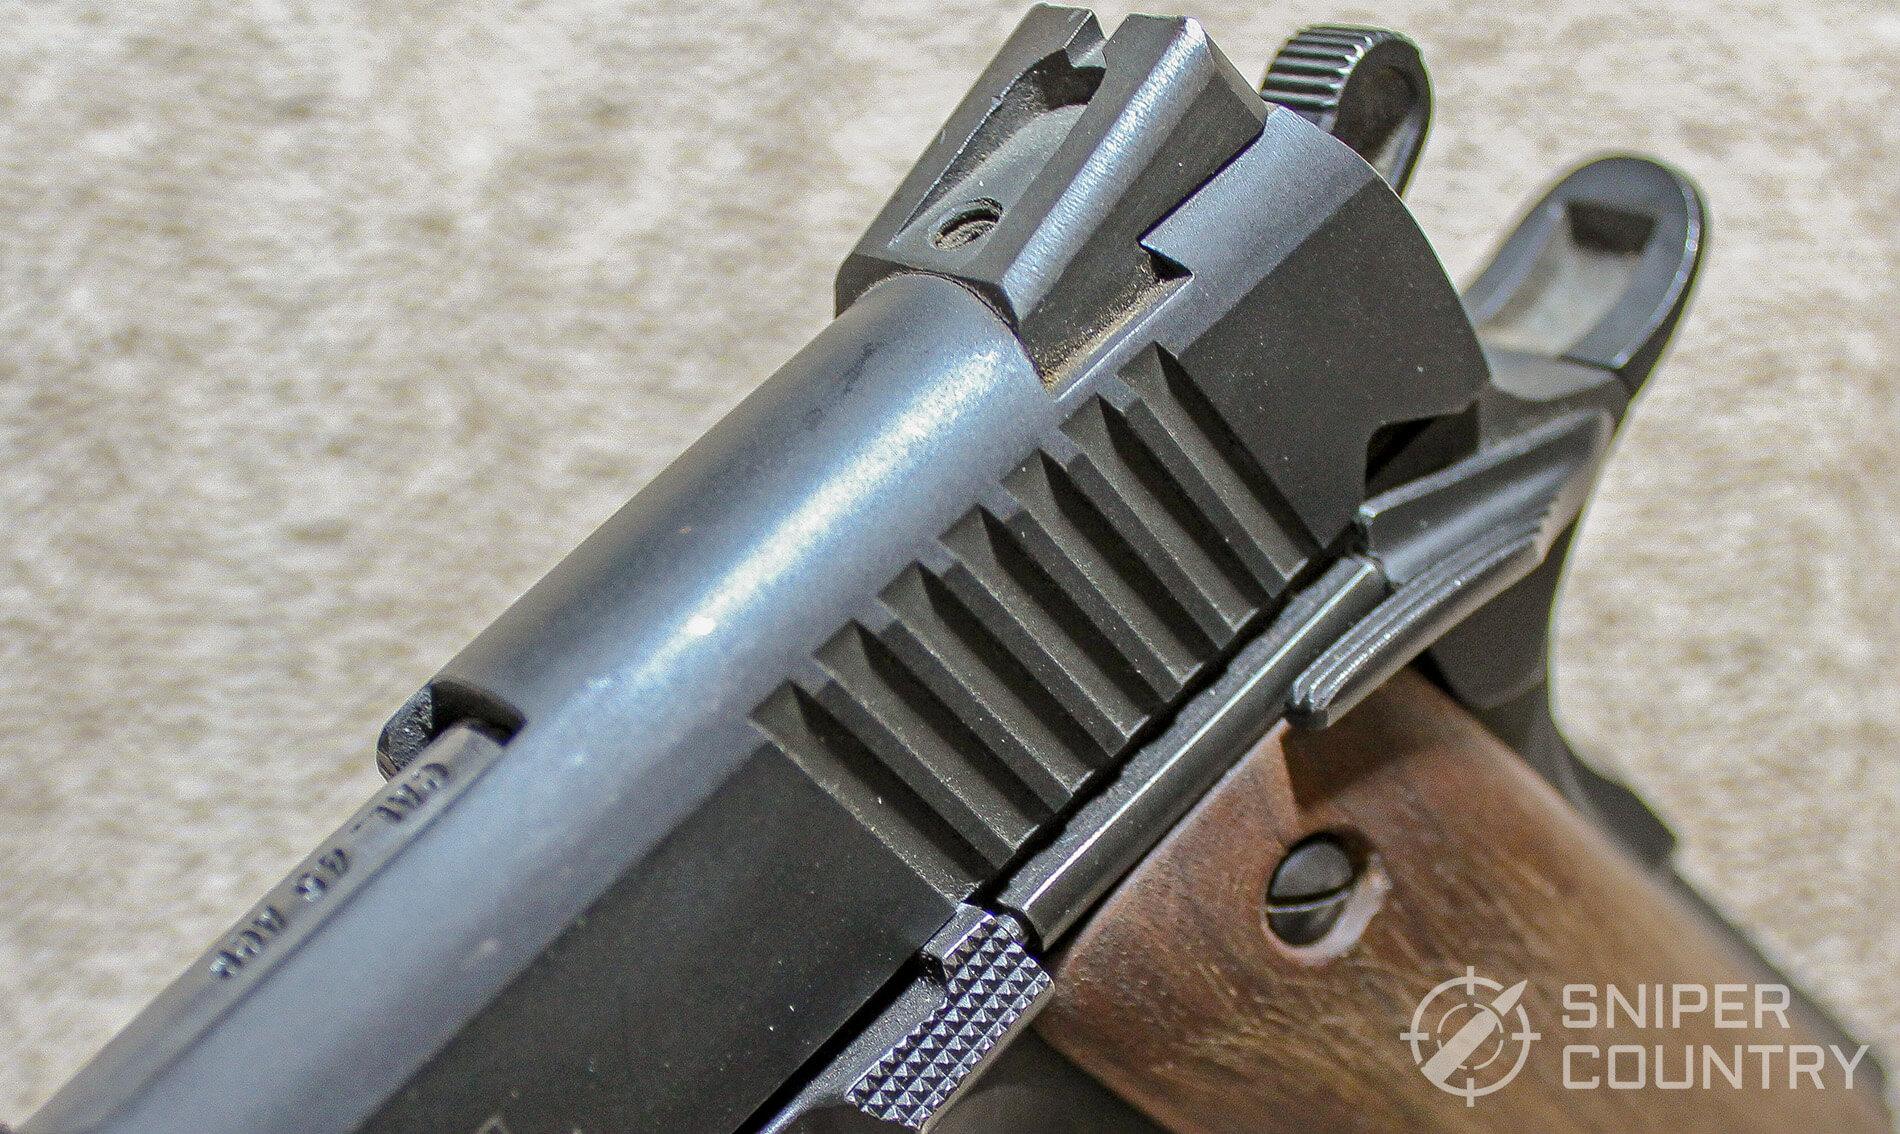 Citadel 1911 rear sight slide stop safety